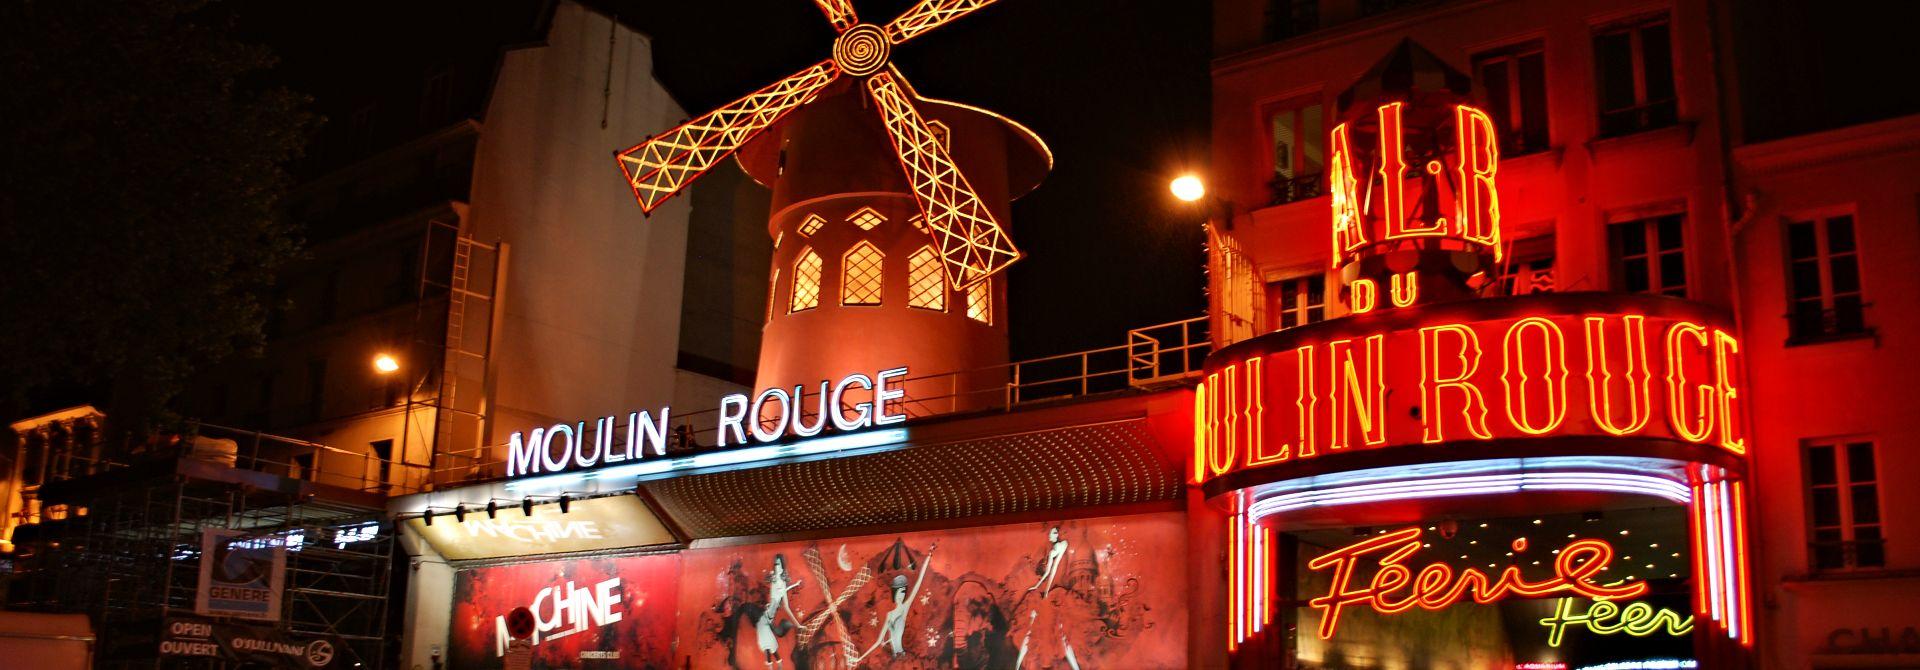 Moulin Rouge Hero